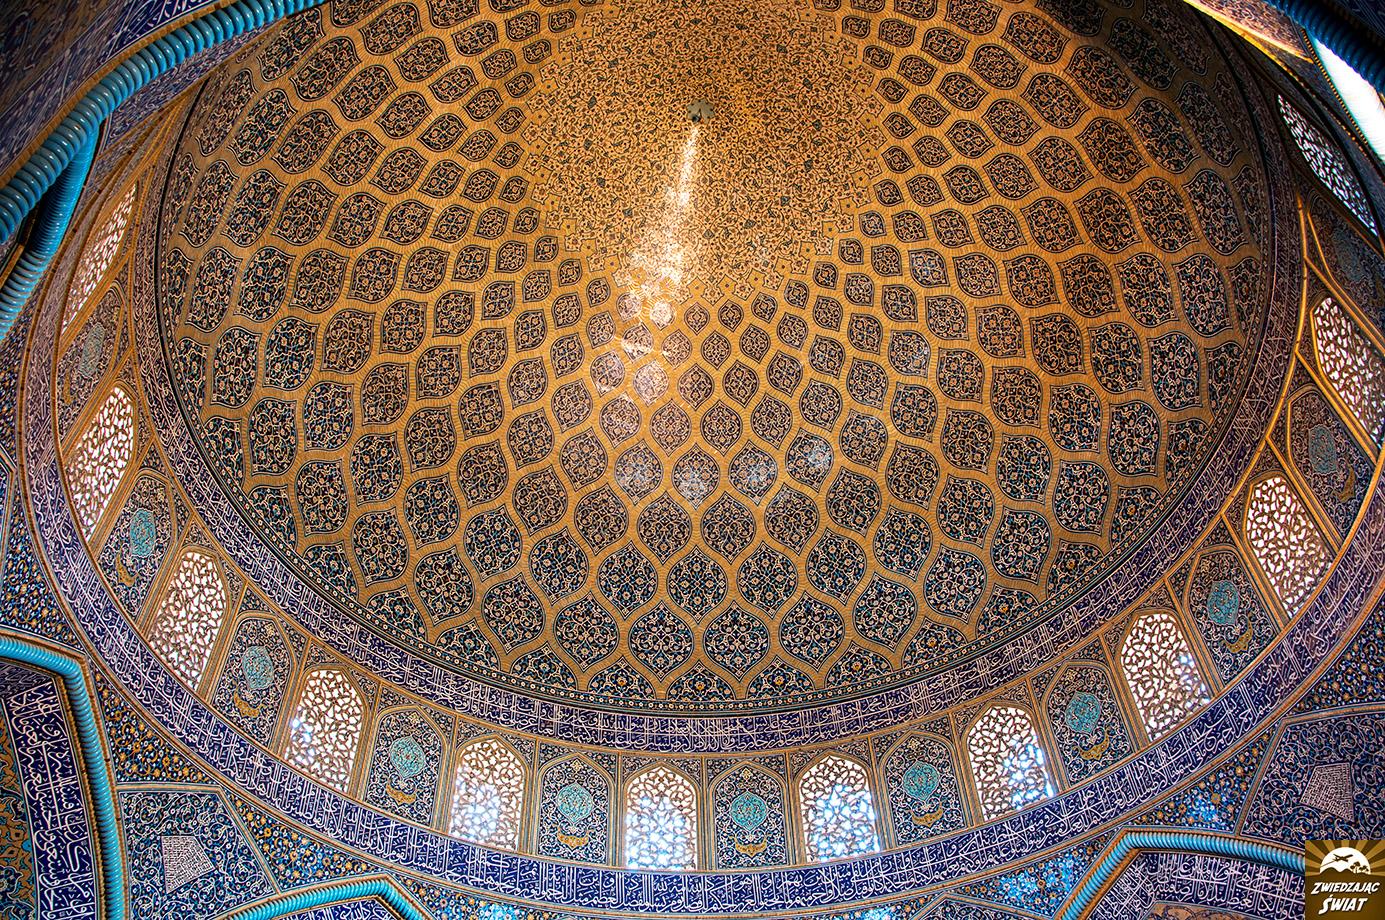 Meczet Szejcha Lotfollaha, Isfahan, Iran